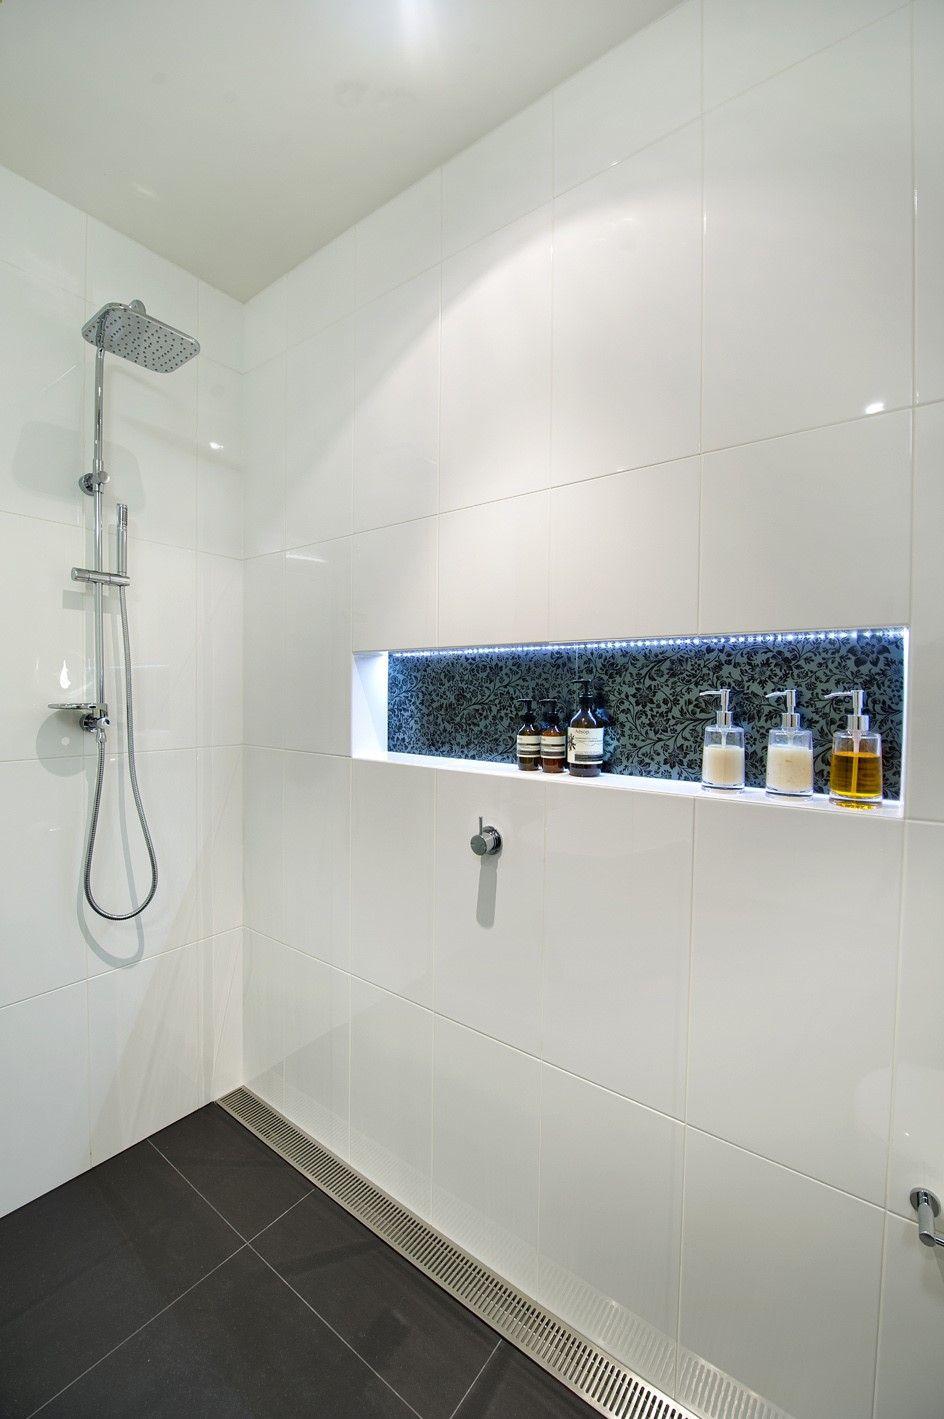 Falsa Ventana Ideal Para Colocar Productos De Aseo Dusche Bodengleich Badezimmer Und Dusche Fliesen